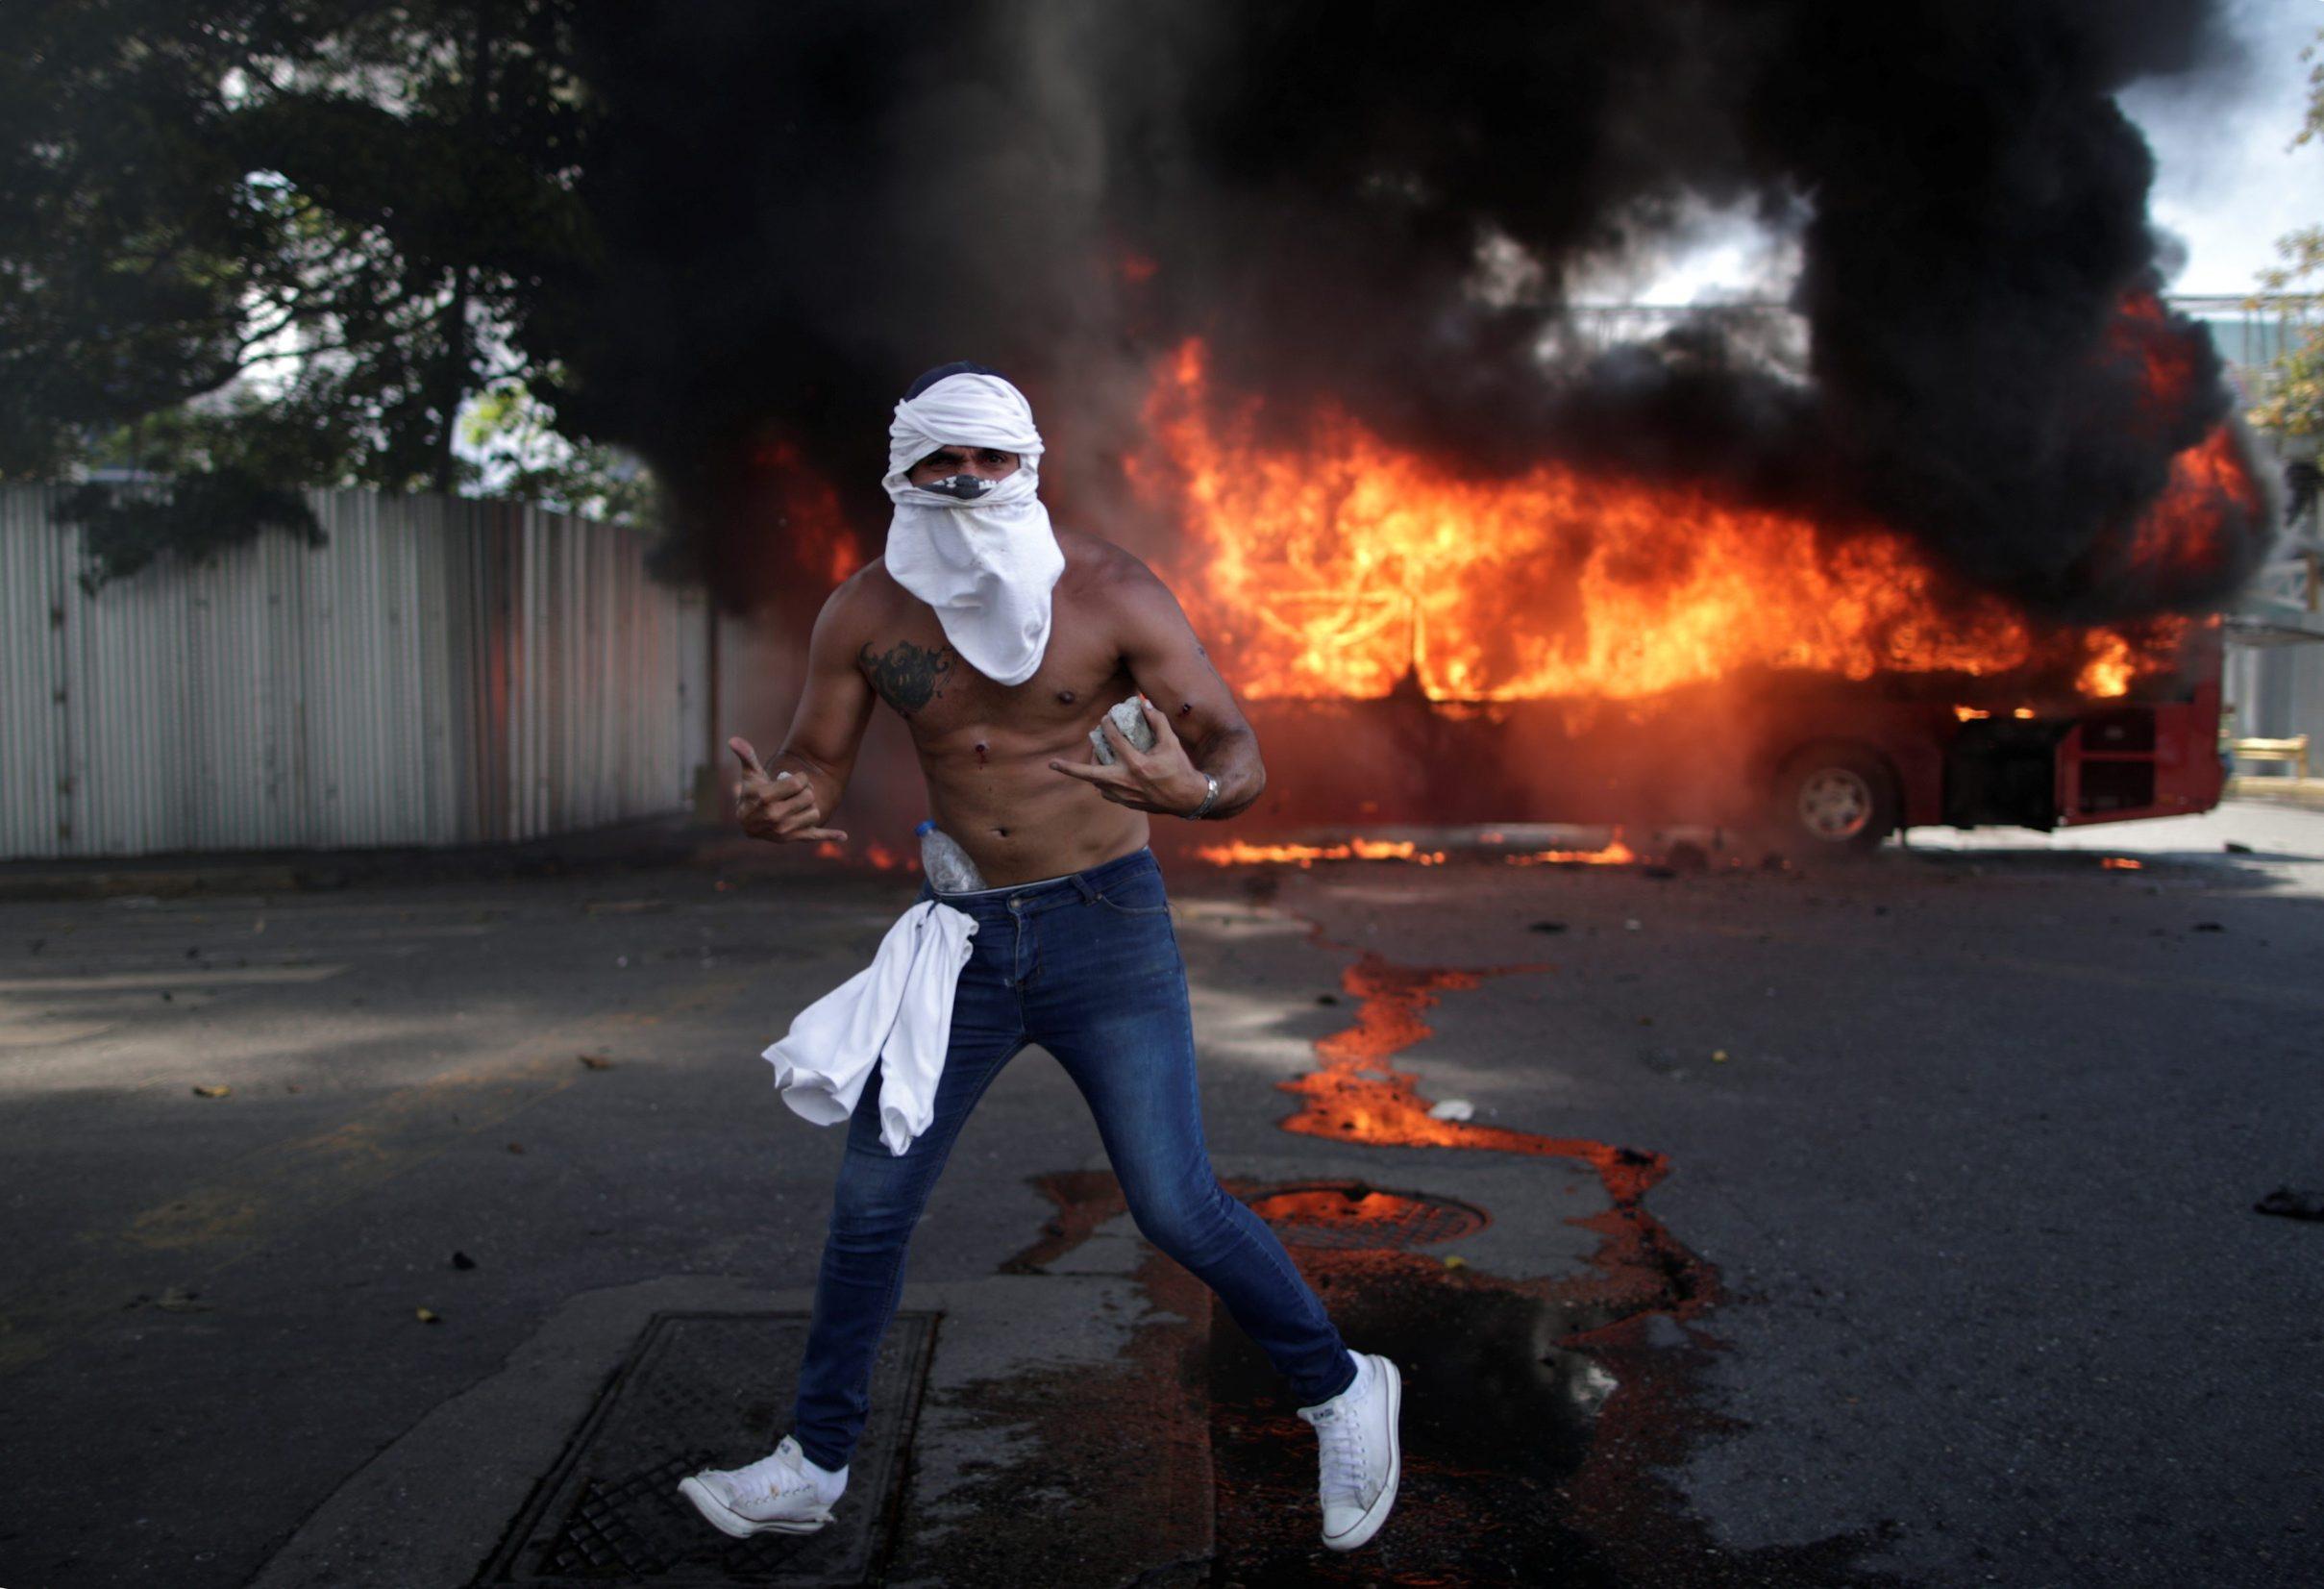 2019-04-30T164119Z_115275129_RC17CD744450_RTRMADP_3_VENEZUELA-POLITICS